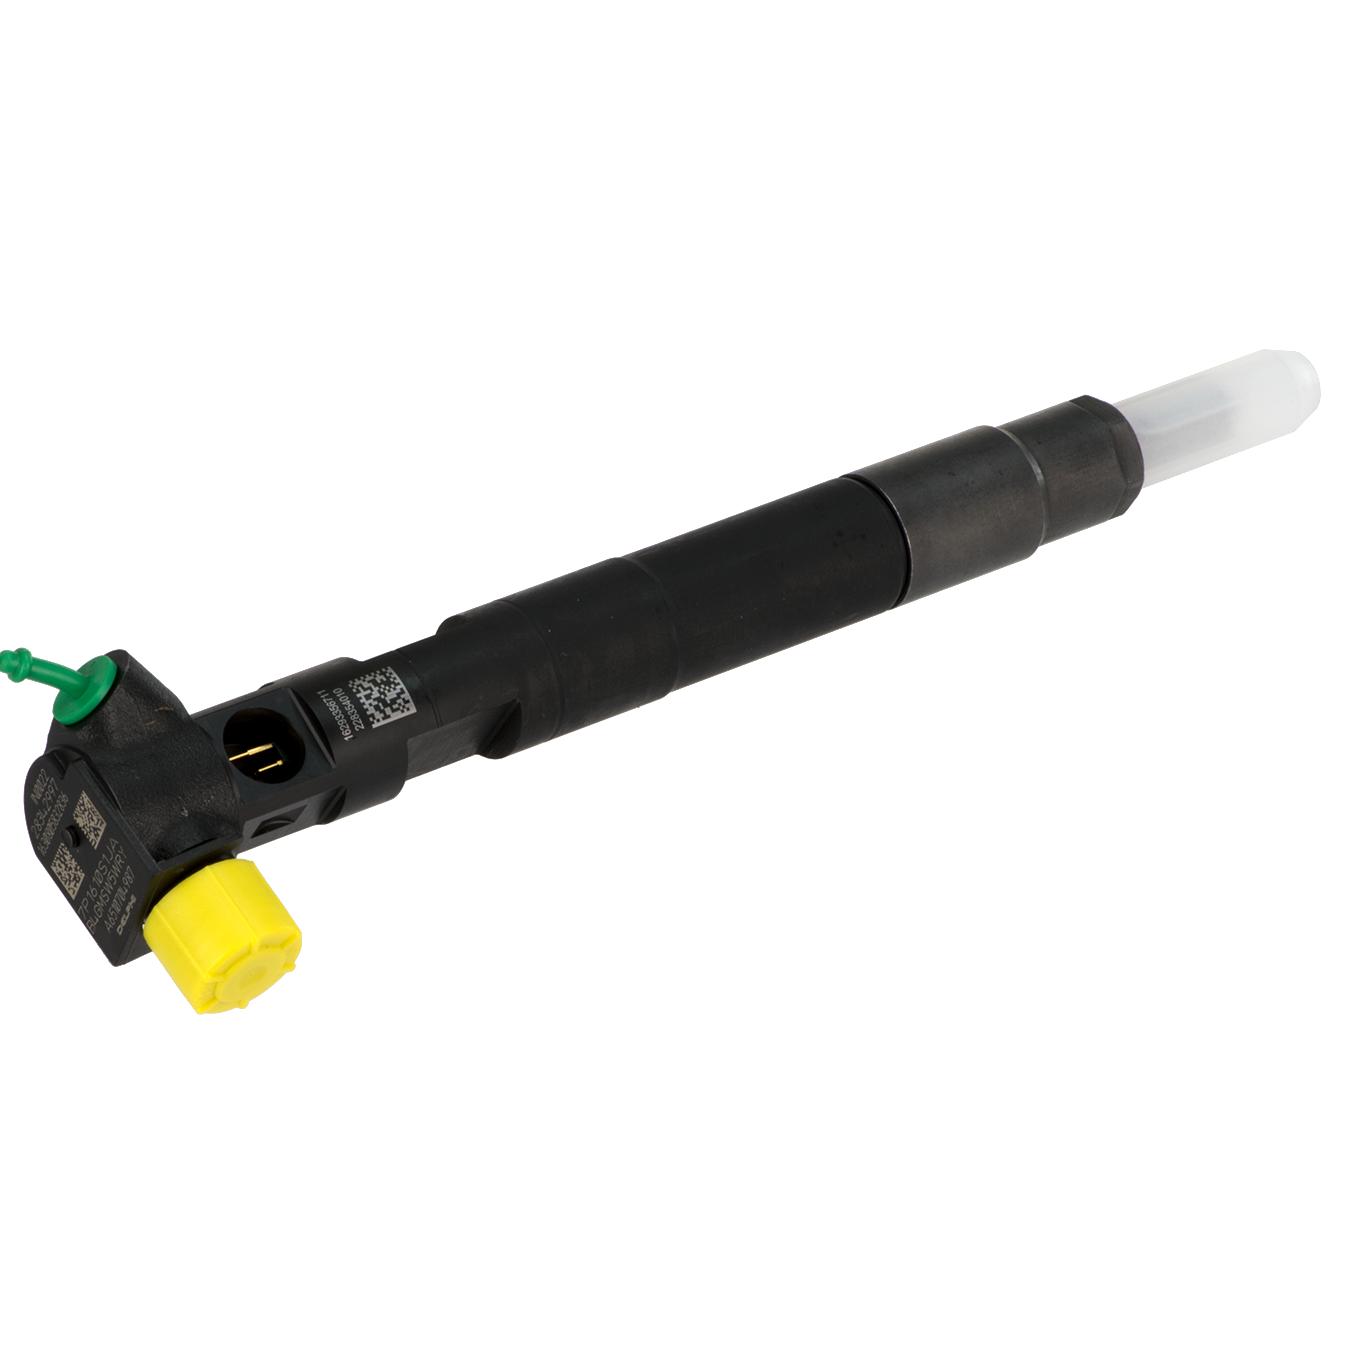 28342997 – New Delphi Injector